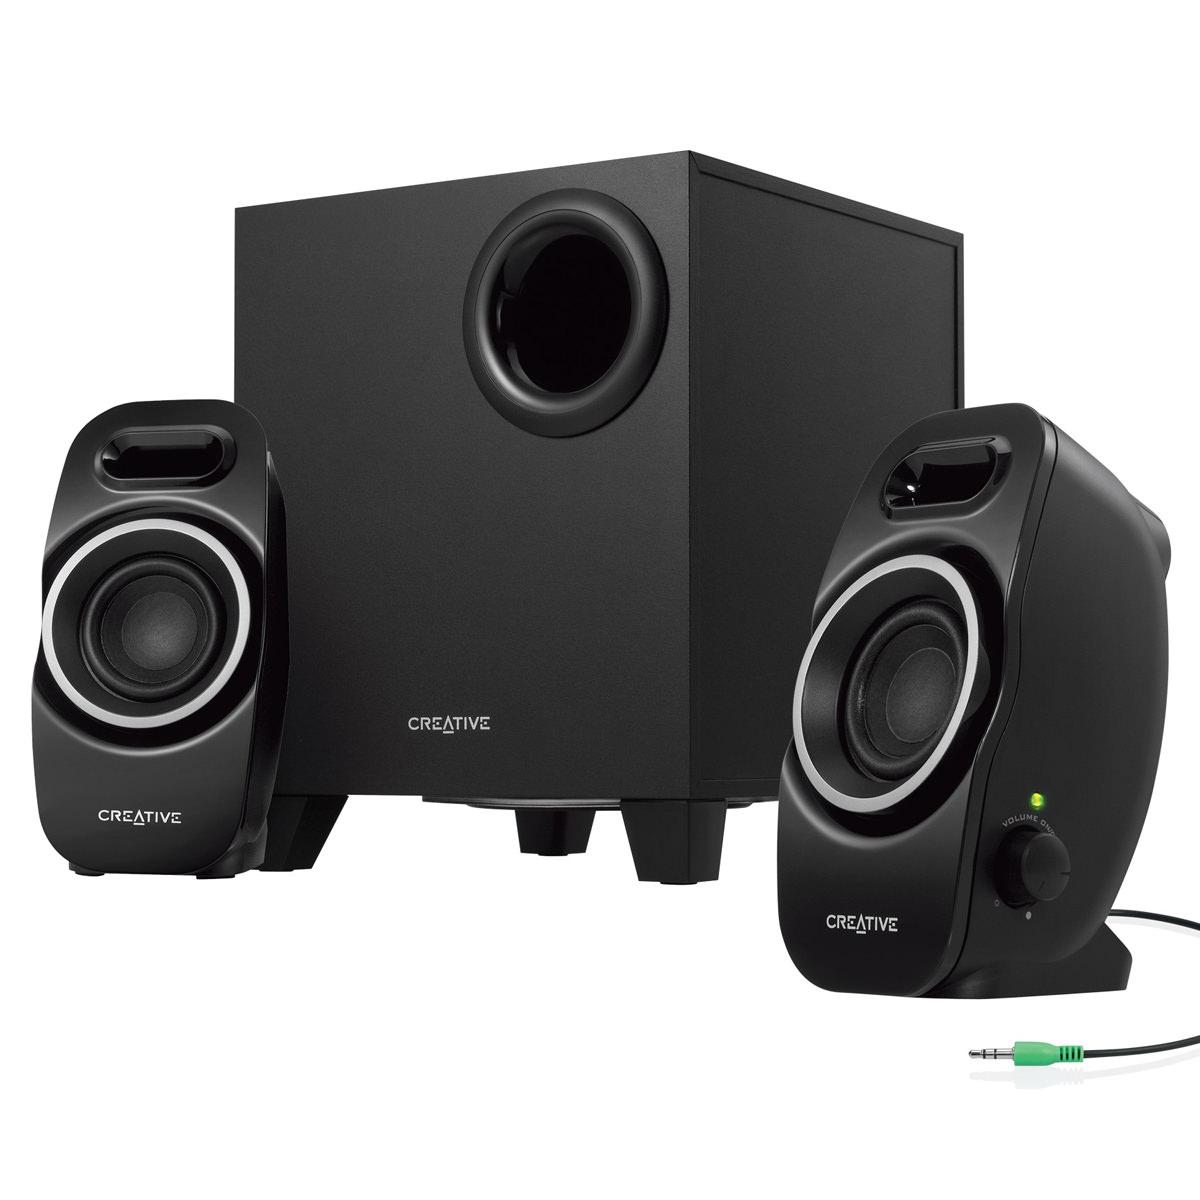 Creative A350 2.1 Speaker System